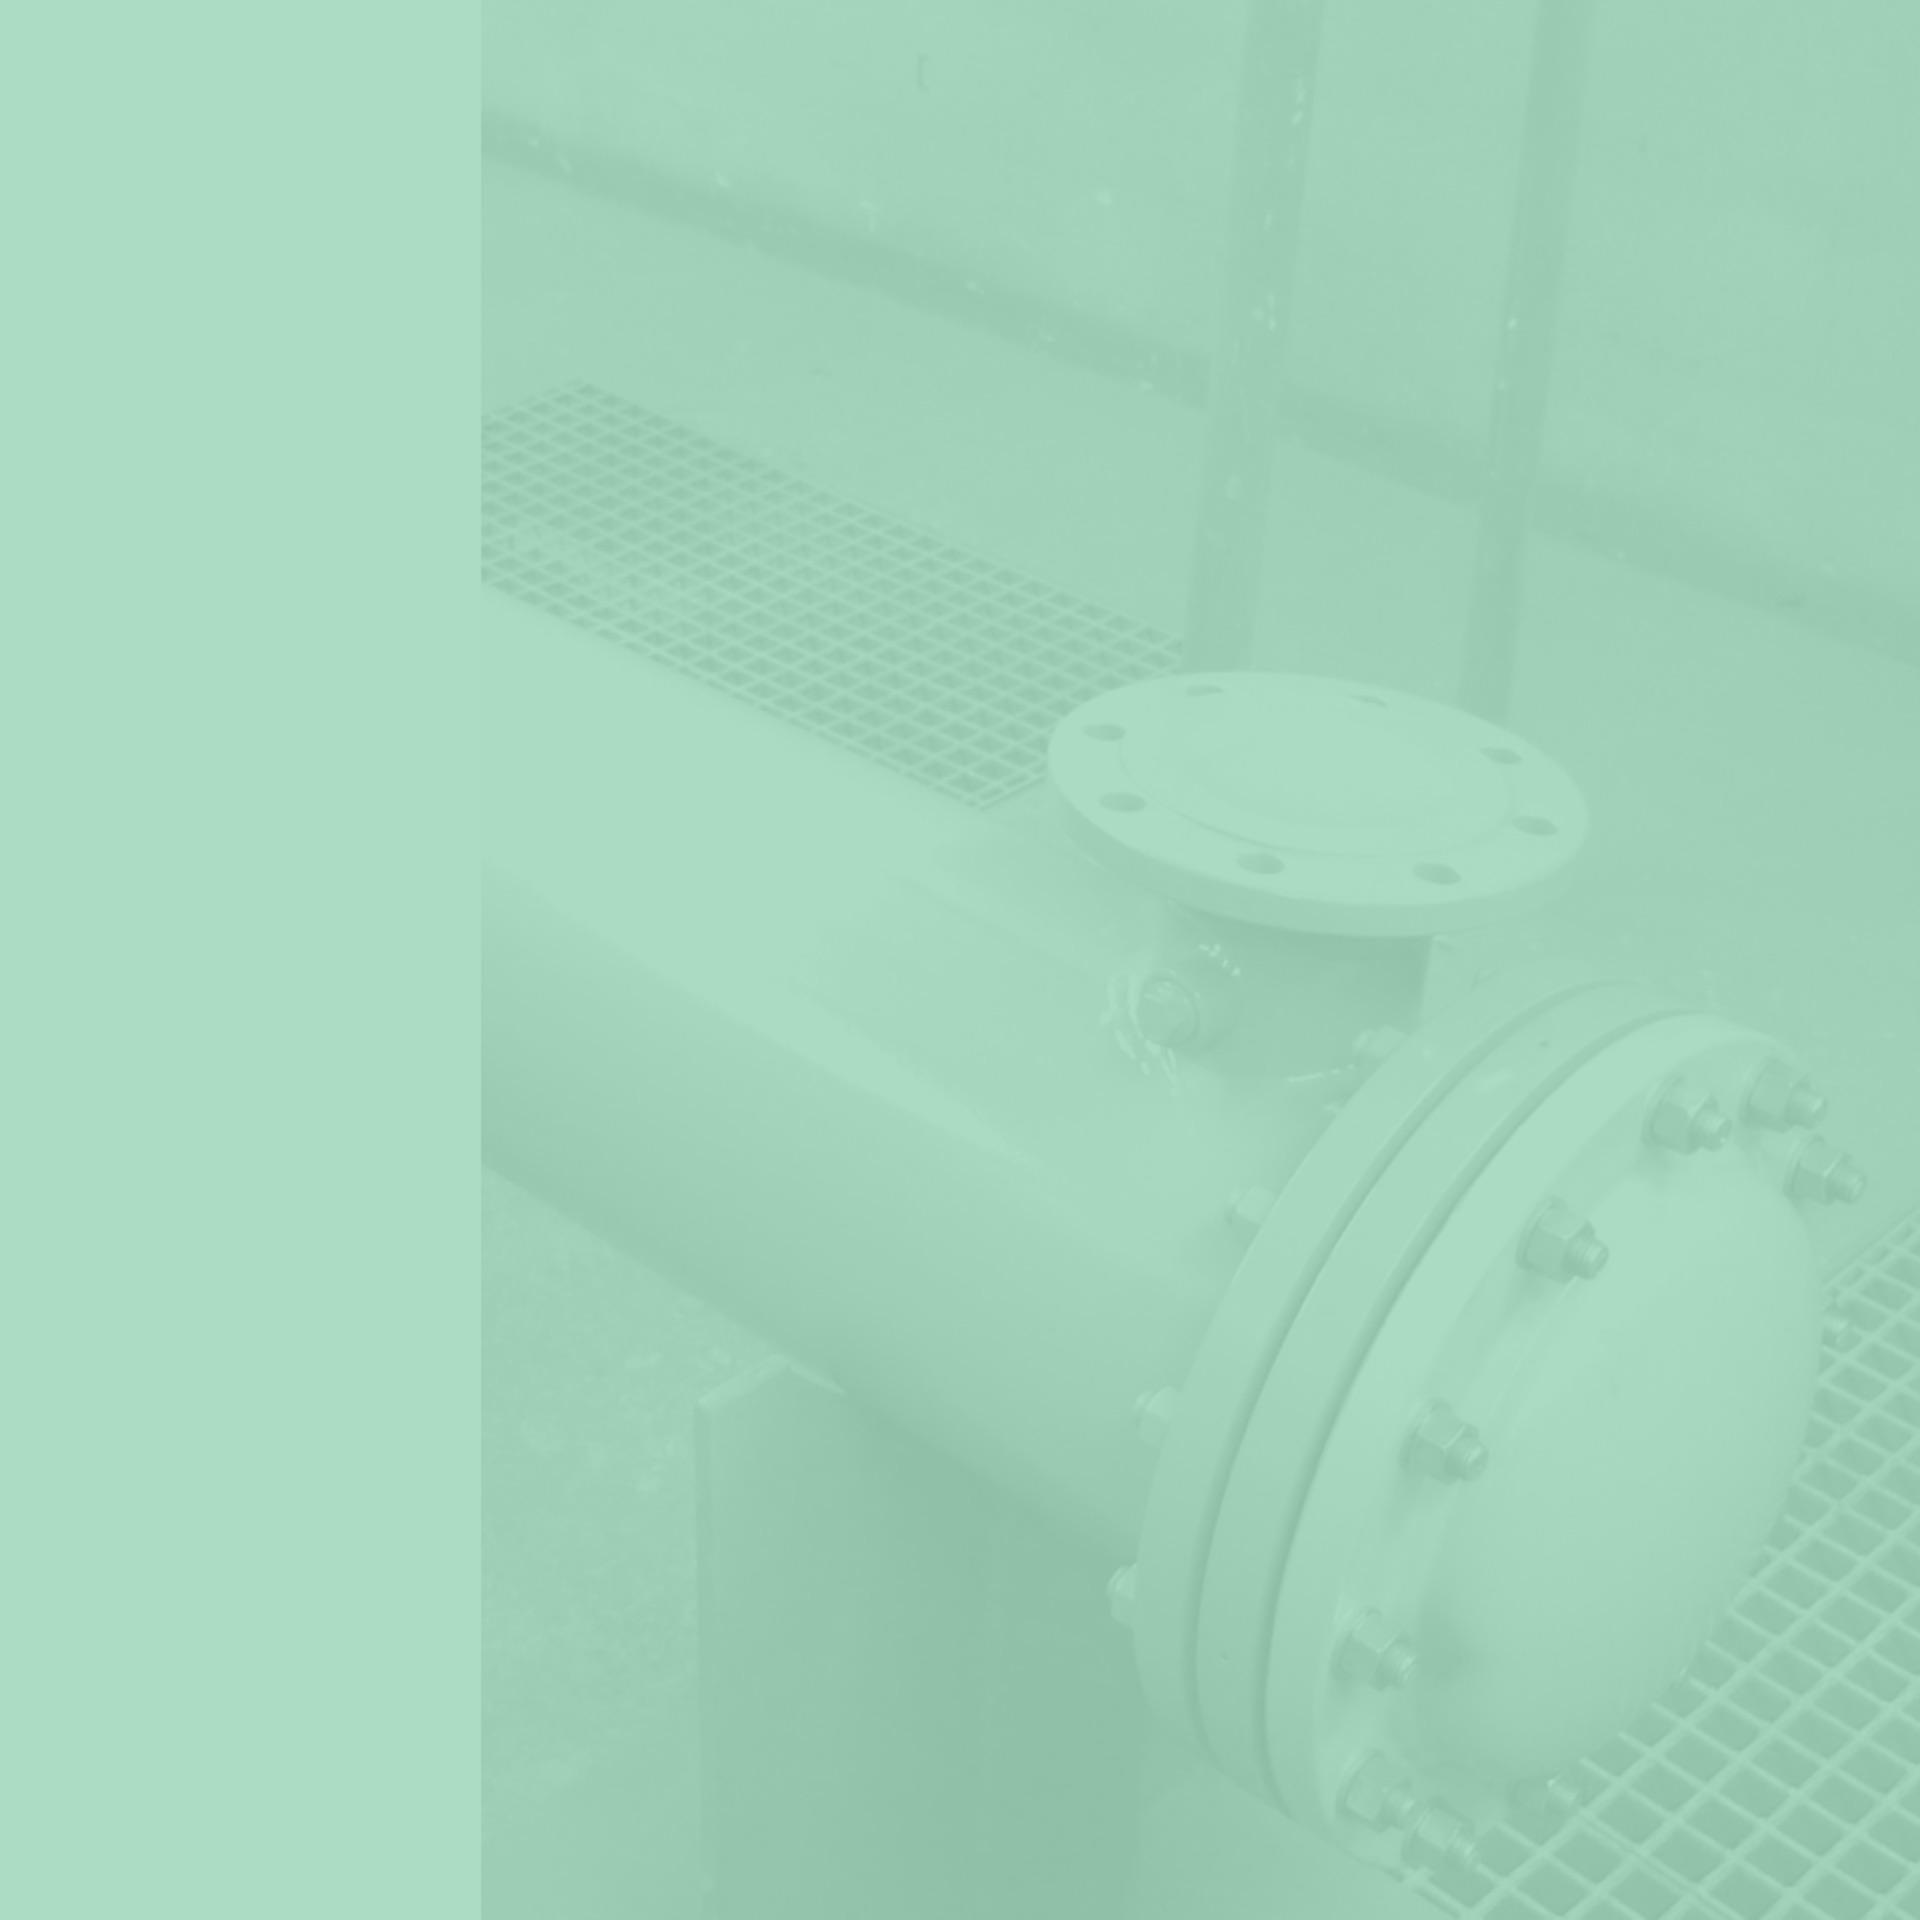 GWA_heat_exchanger_tube_bundle_heat_exchanger_oil_water_cooler_with_drawable_tube_bundle_Gesellschaft_fuer_Waerme_und_Anlagentechnik_mbH_monochrom